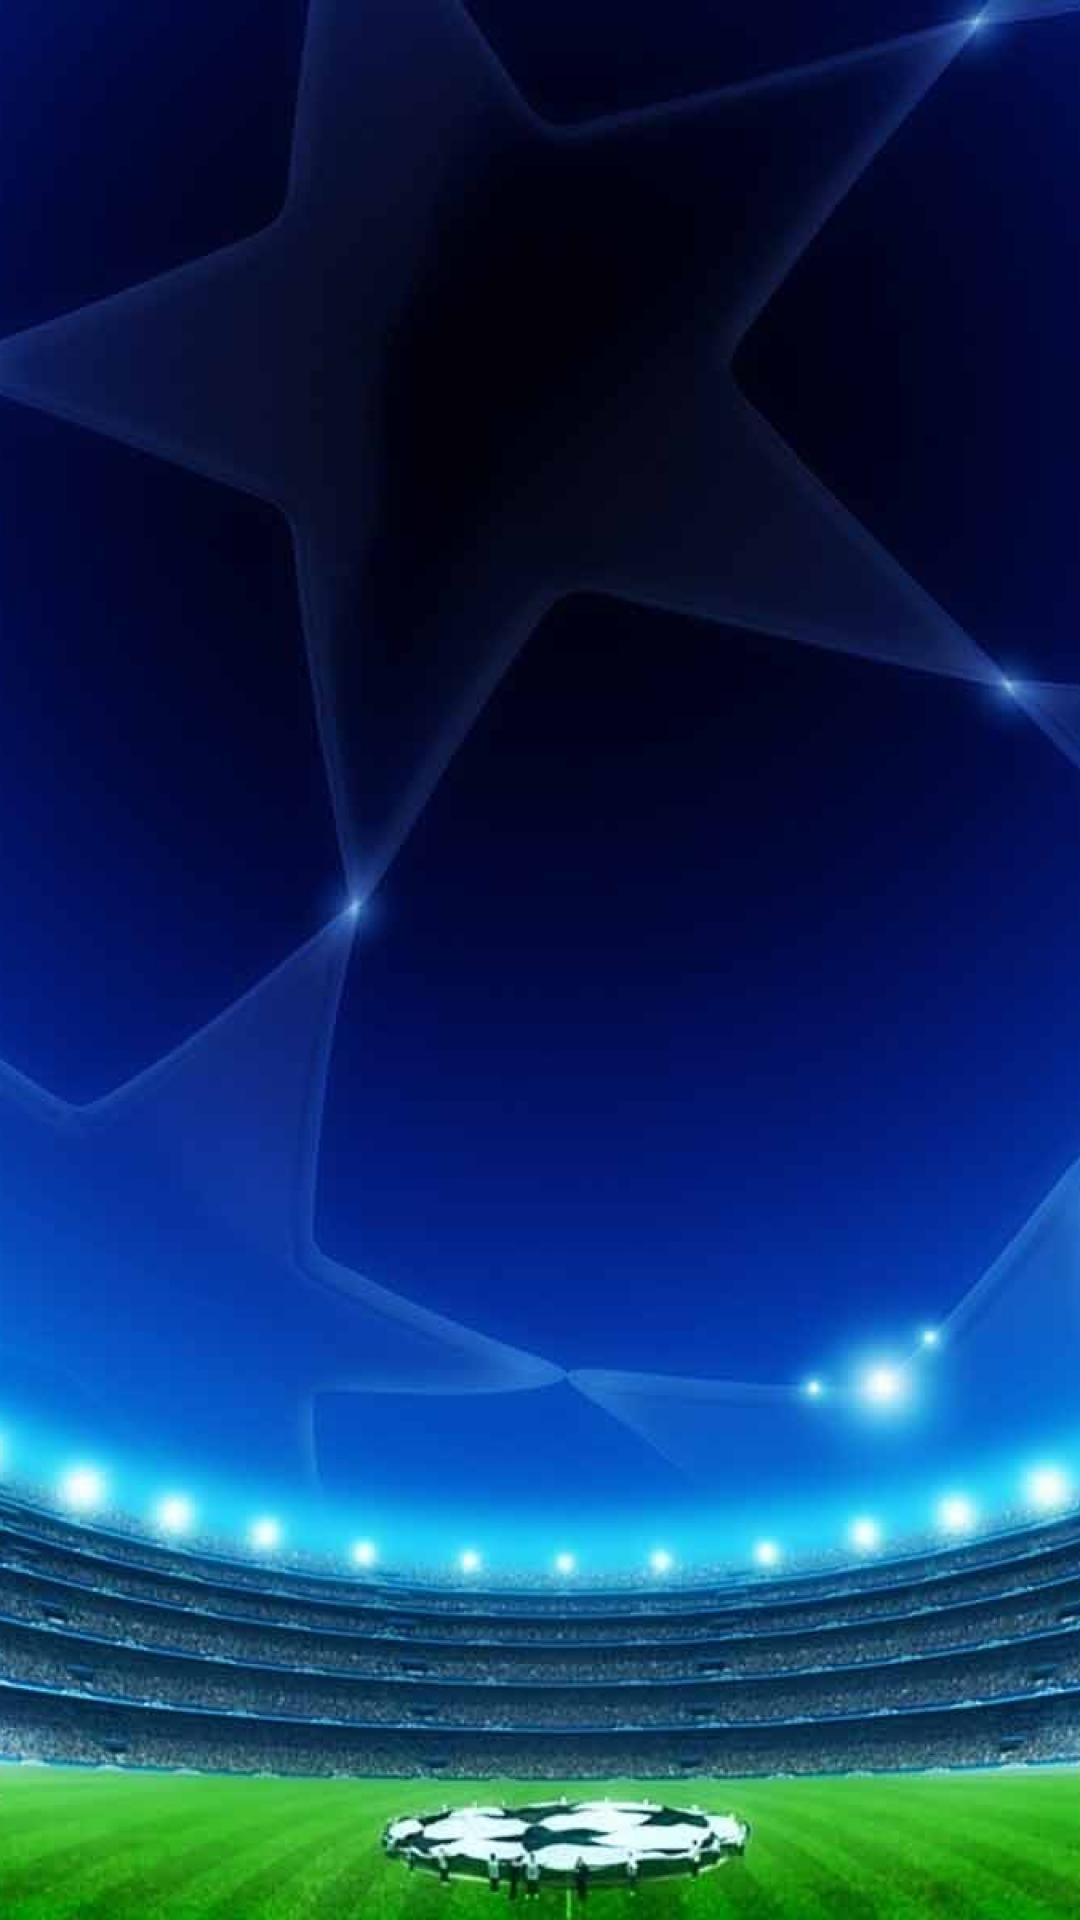 Champions league wallpaper 41640 1080x1920